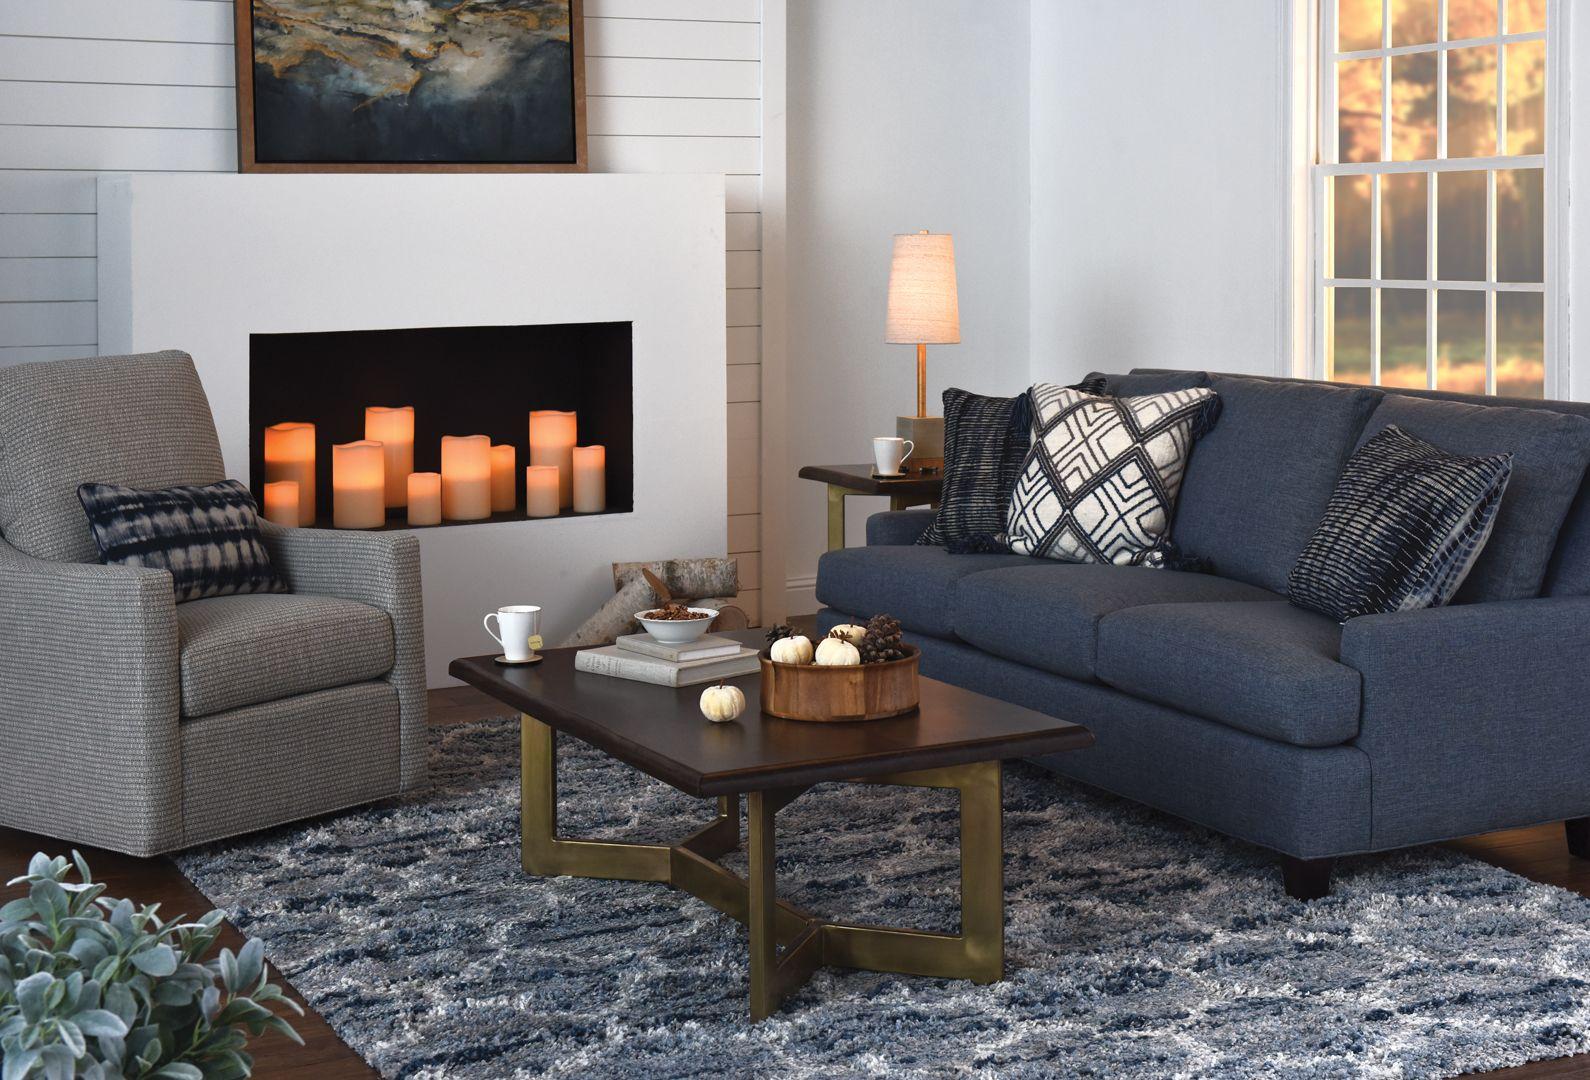 Pin By Luv 2 Fashion On Decor Ideas Decor Home Decor Home